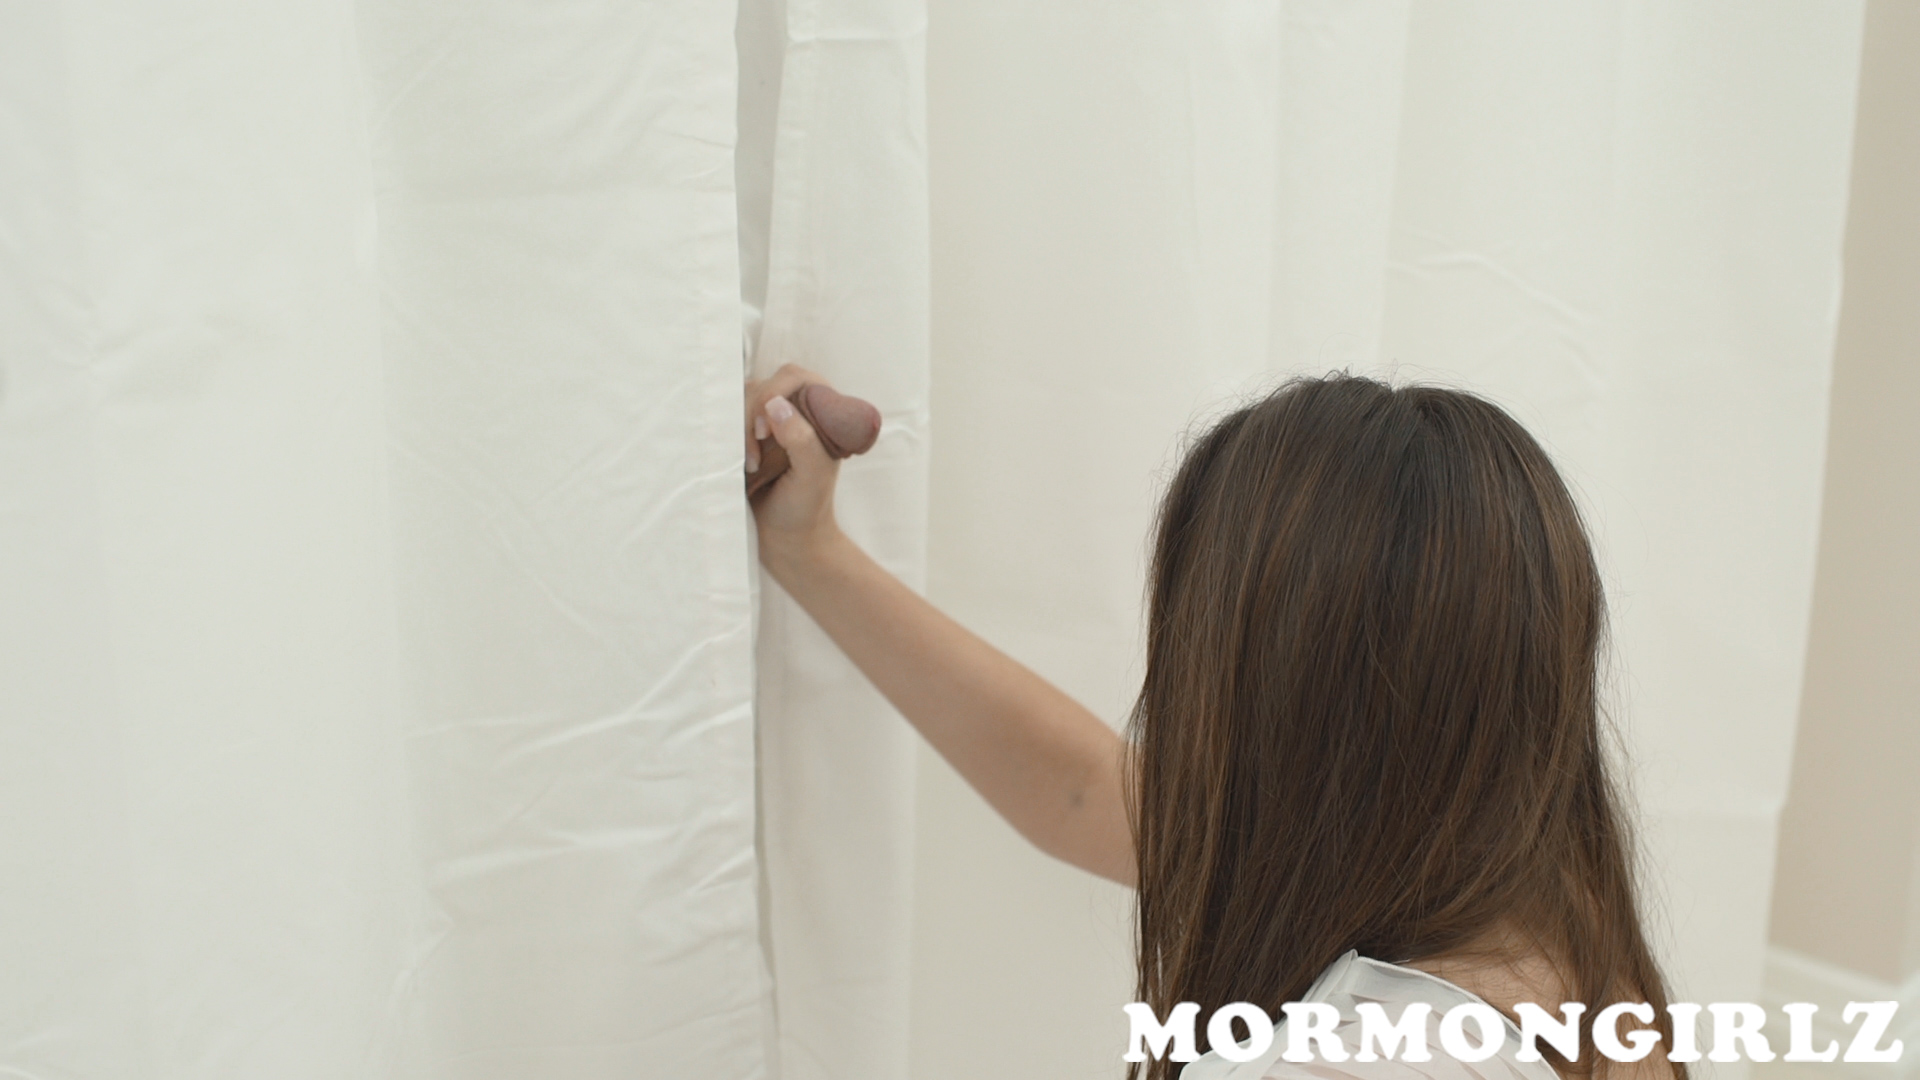 mormongirlz_75_07